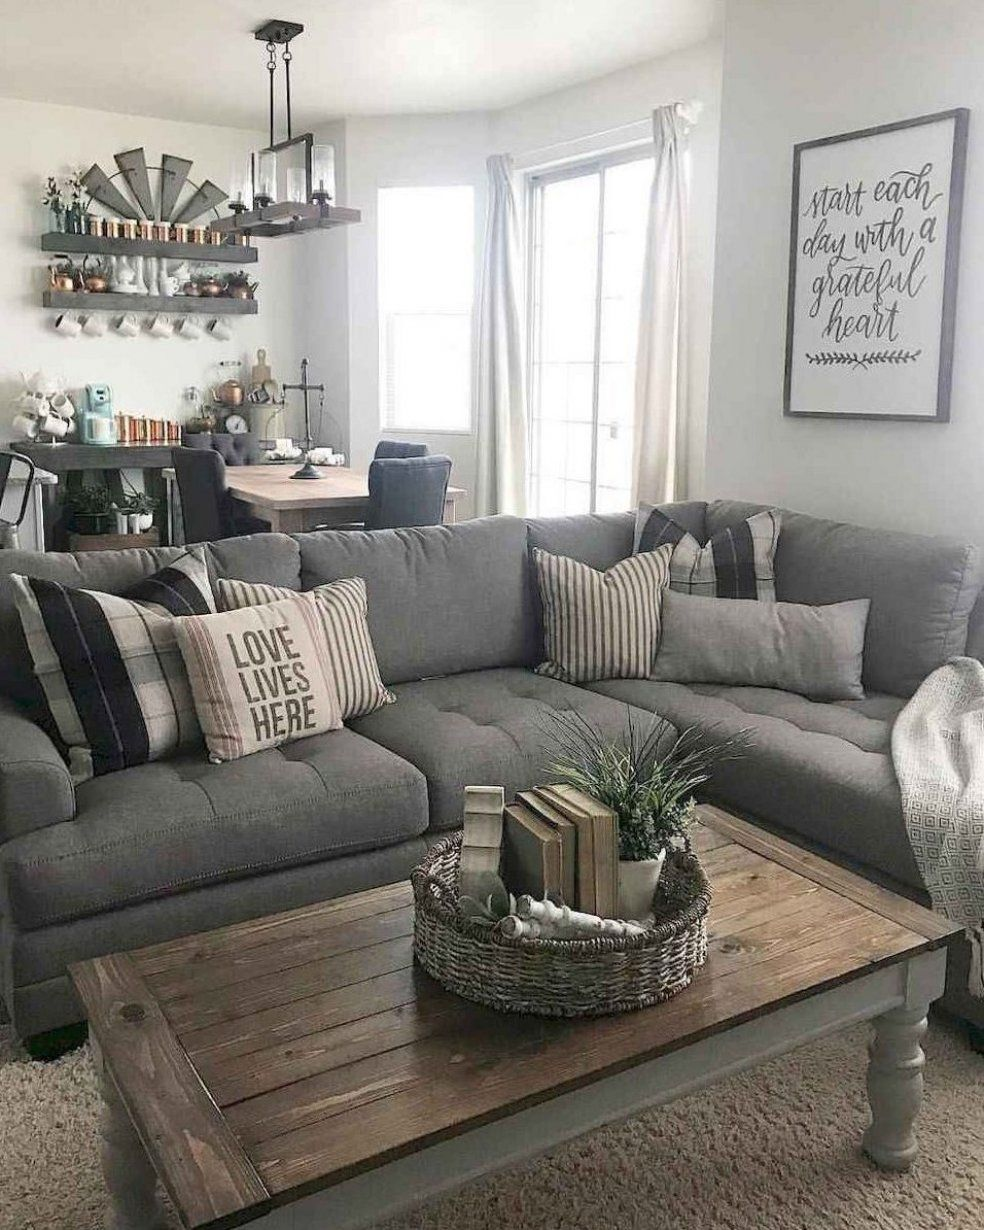 6 cozy modern farmhouse living room decor ideas #hom in 6